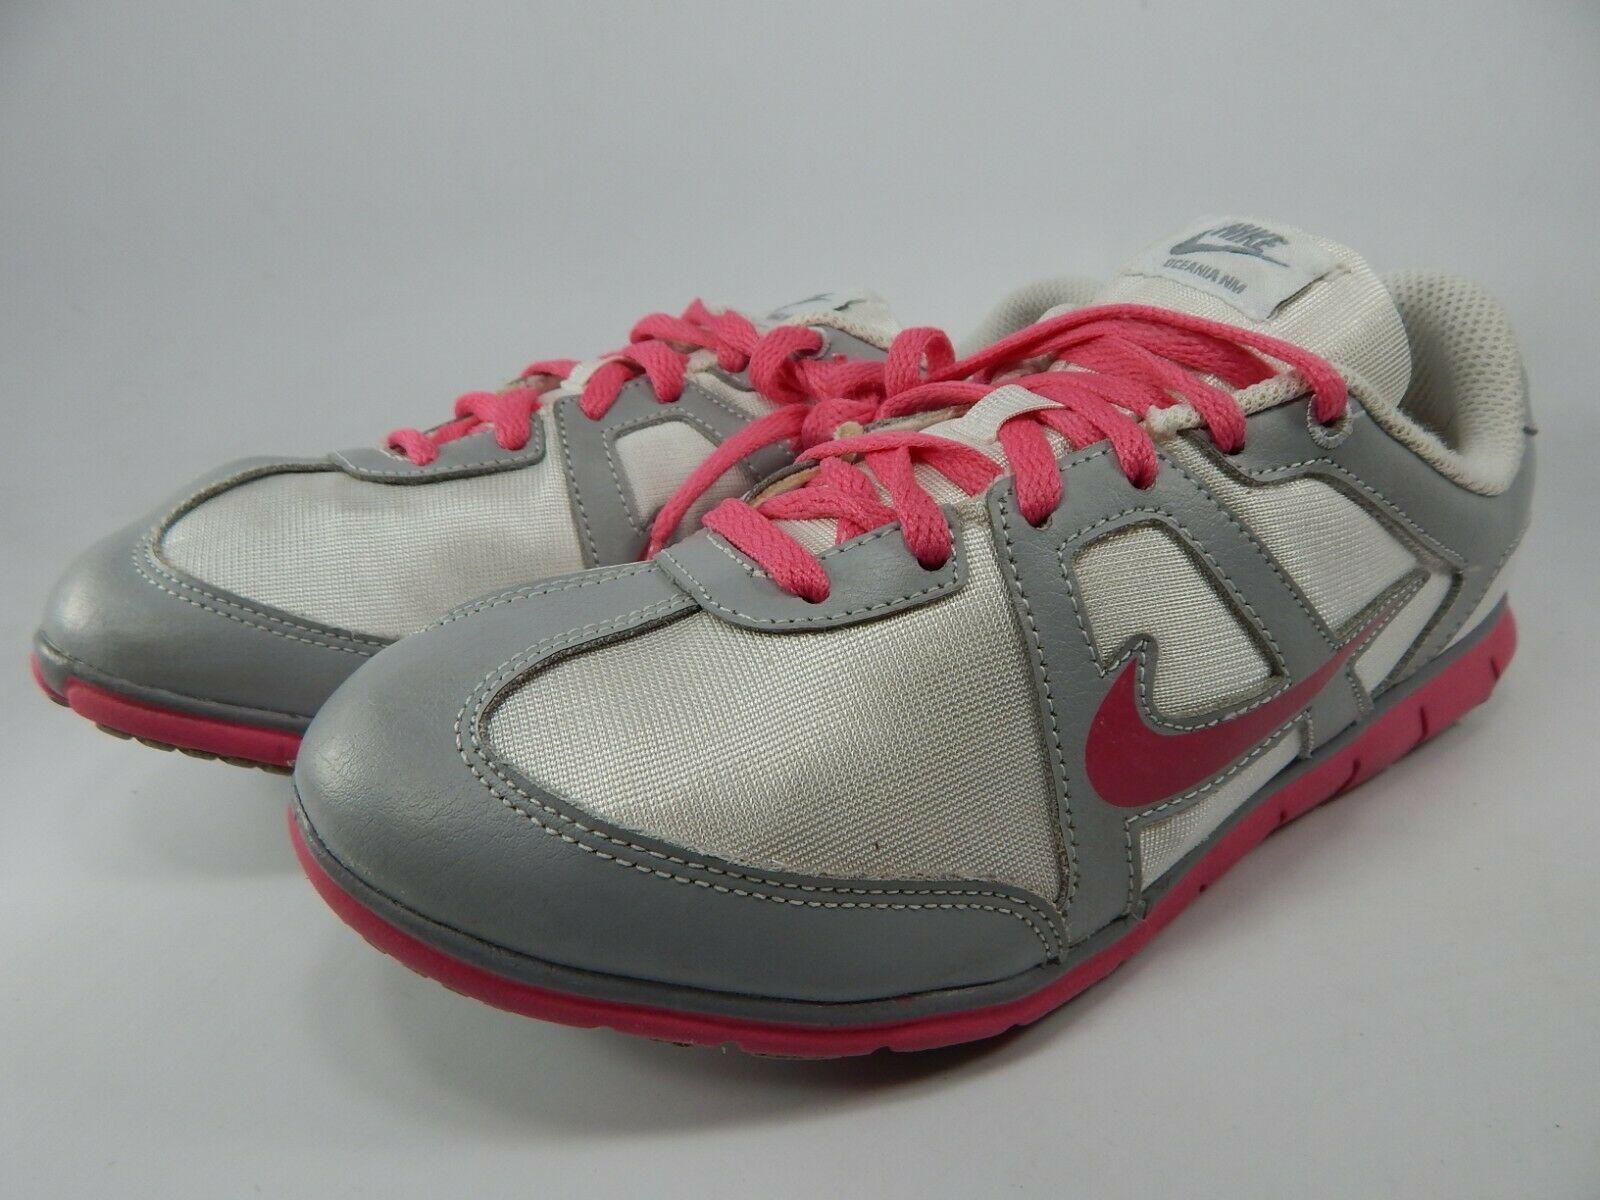 Nike Oceania NM Misura 6.5 M (B) Eu 37.5 Donna Scarpe Sneakers Bianco 677136-610